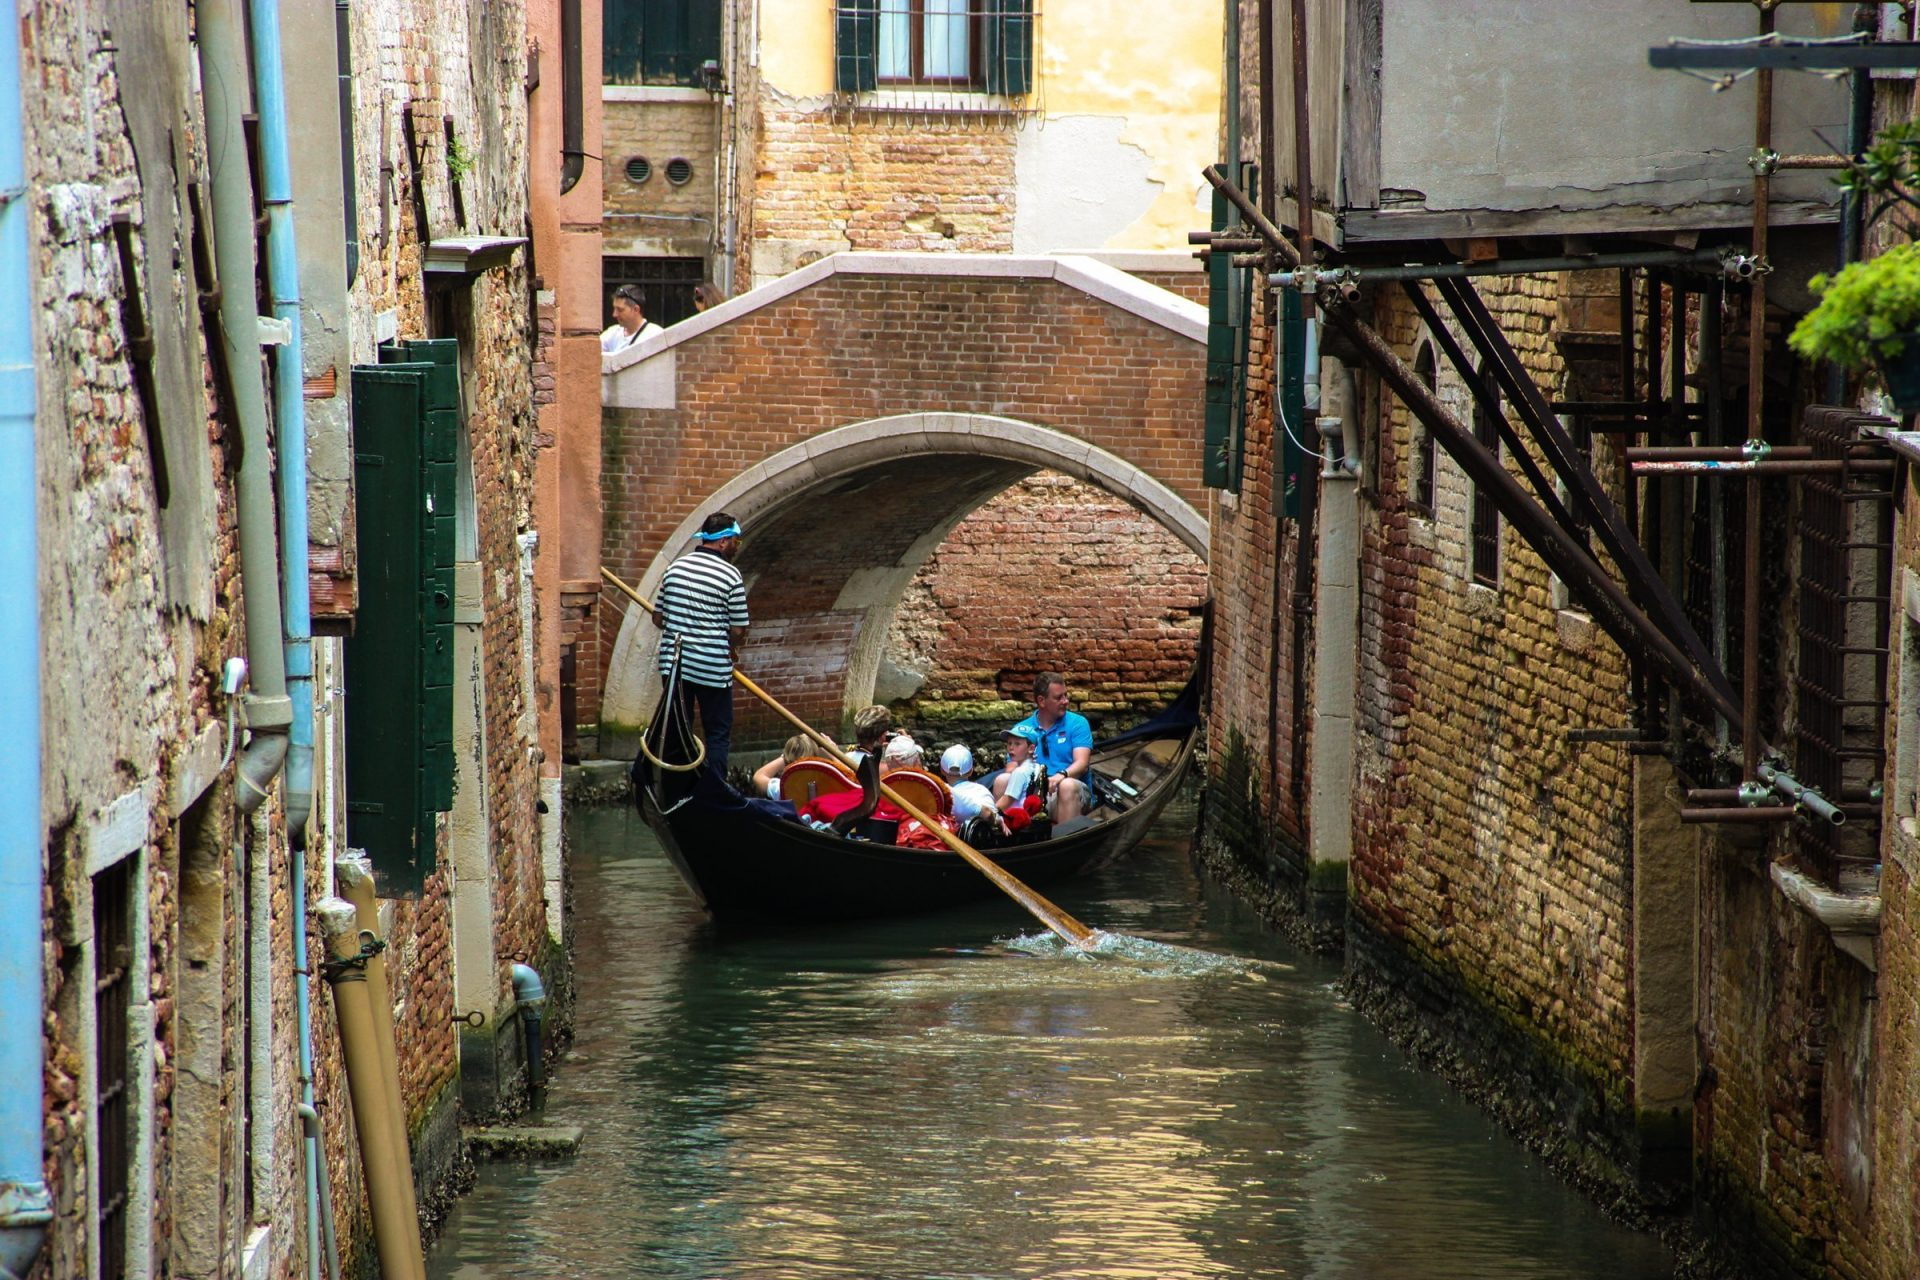 Tourists On Gondola In Canal Near Bridge